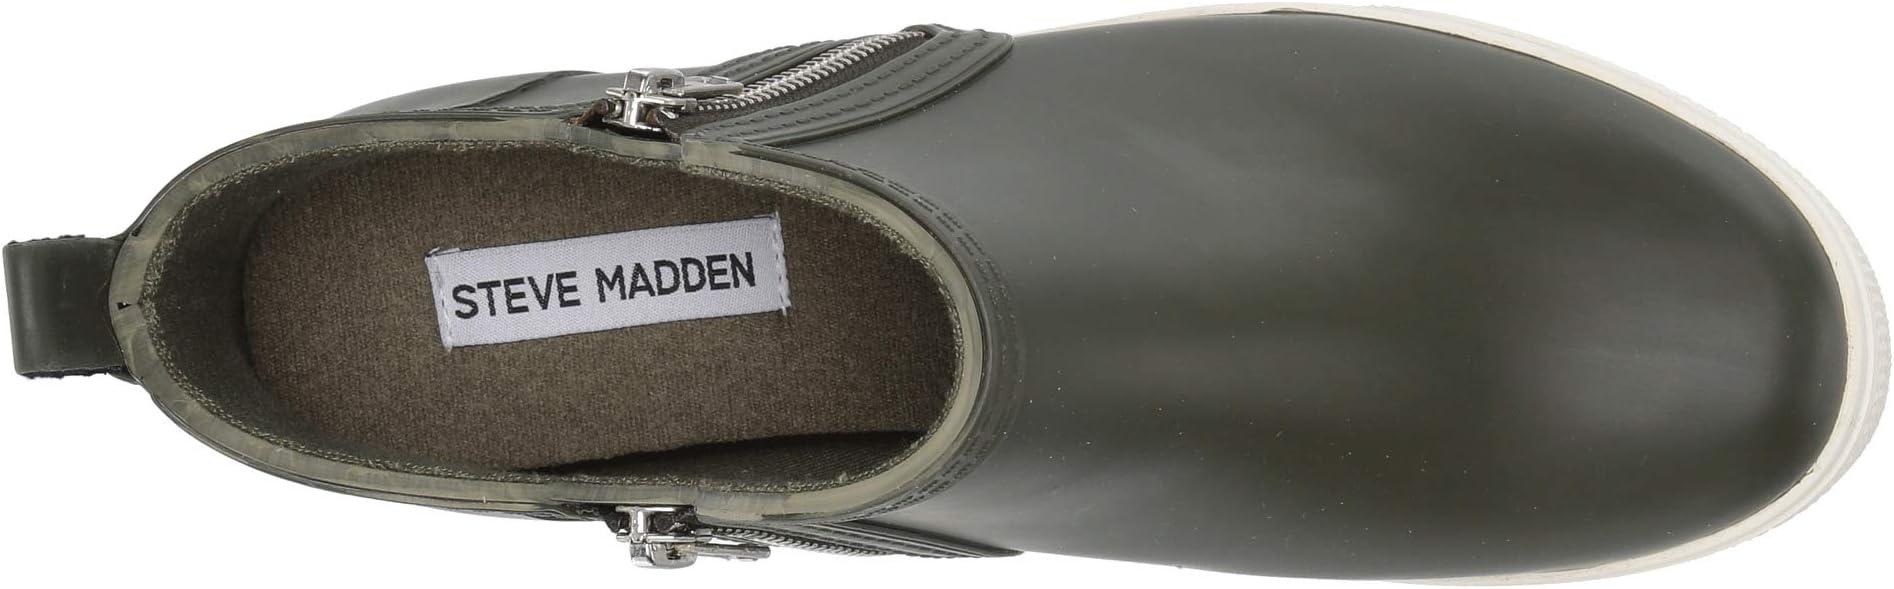 Steve Madden Wedgie - RB Rainboot | Women's shoes | 2020 Newest